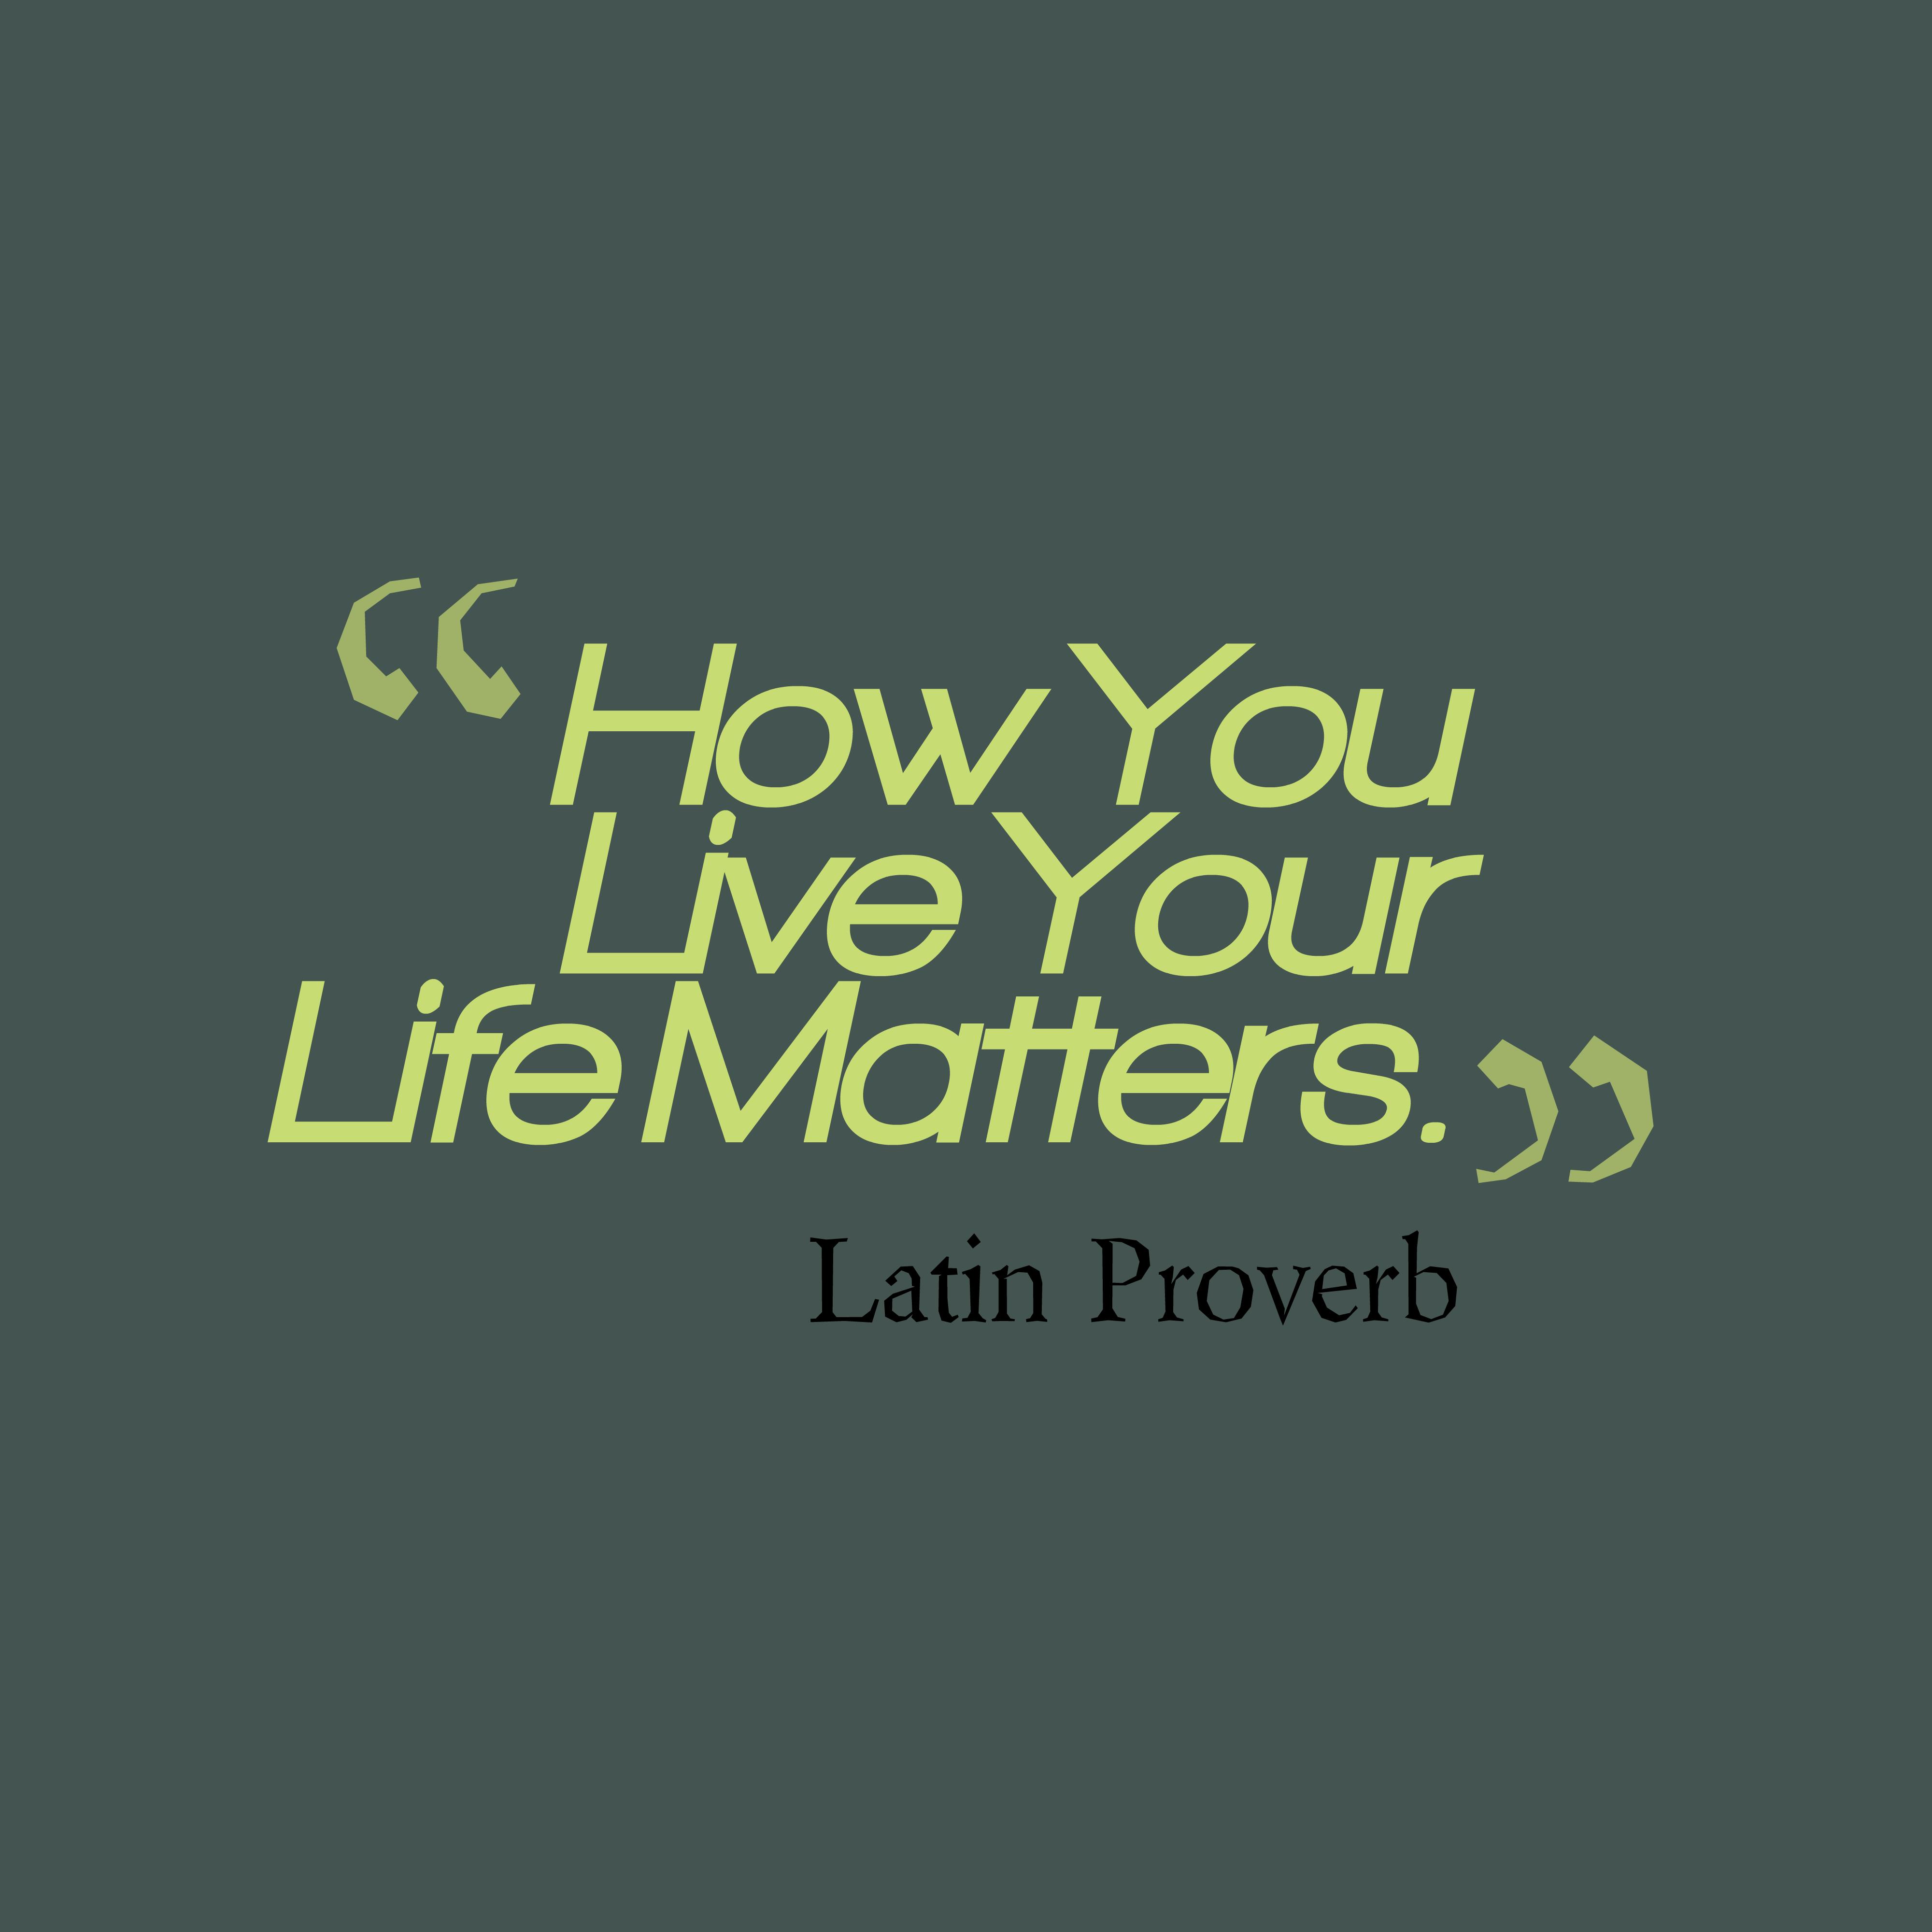 Latin Wisdom About Advertises: Latin Wisdom About Life